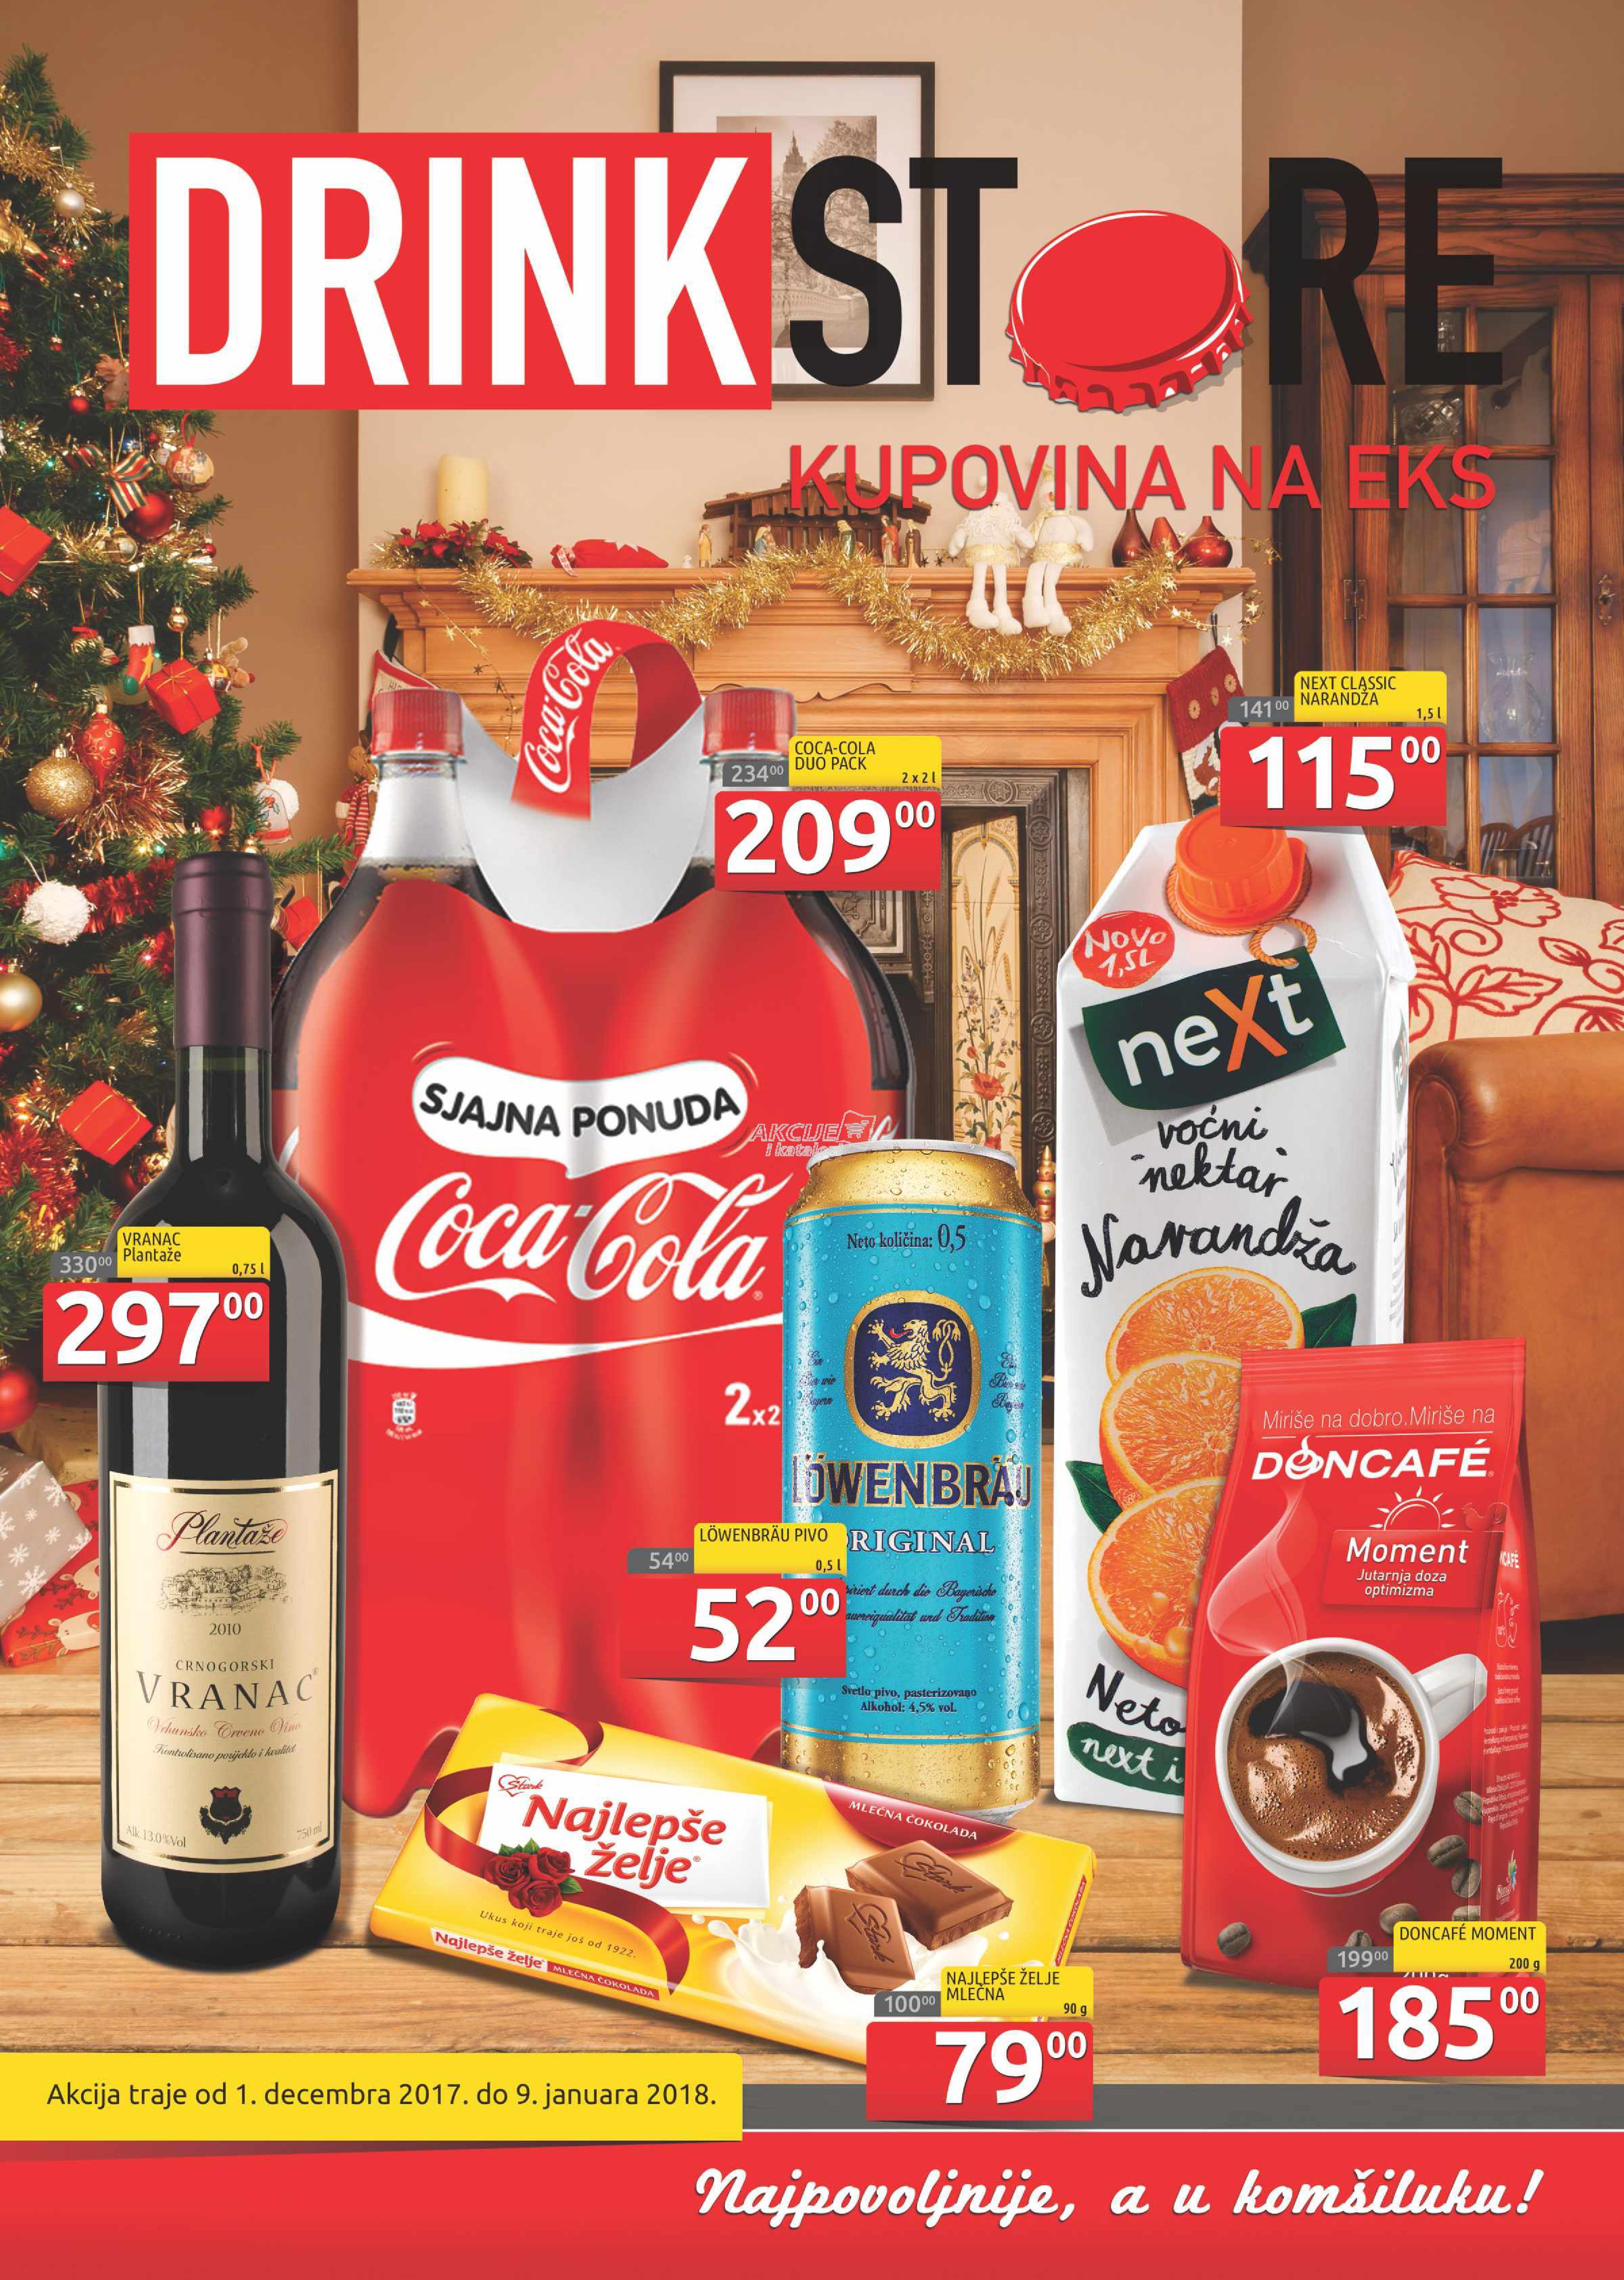 Drink Store - Redovna akcija praznične kupovine